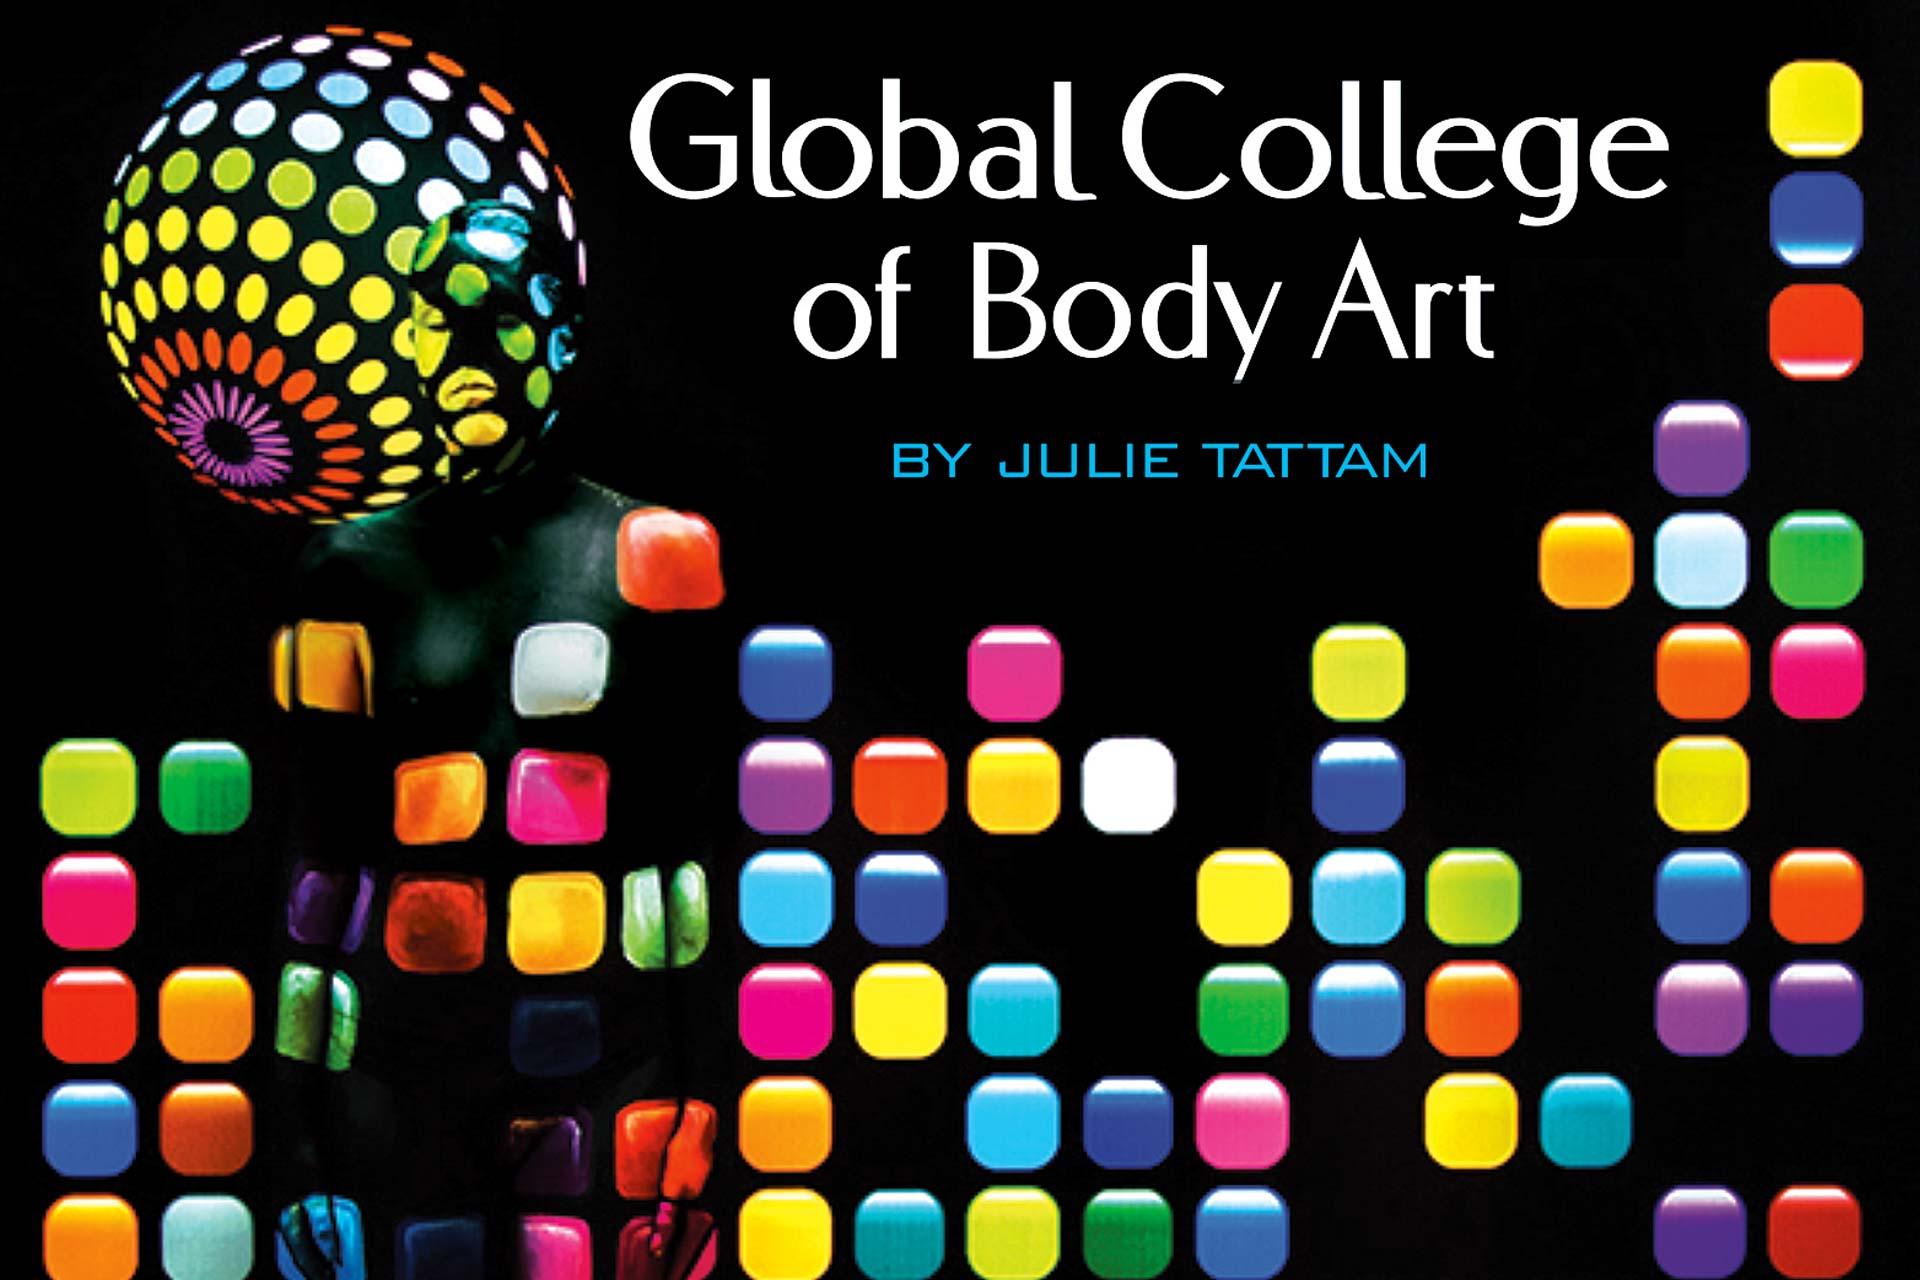 Global College of Body Art